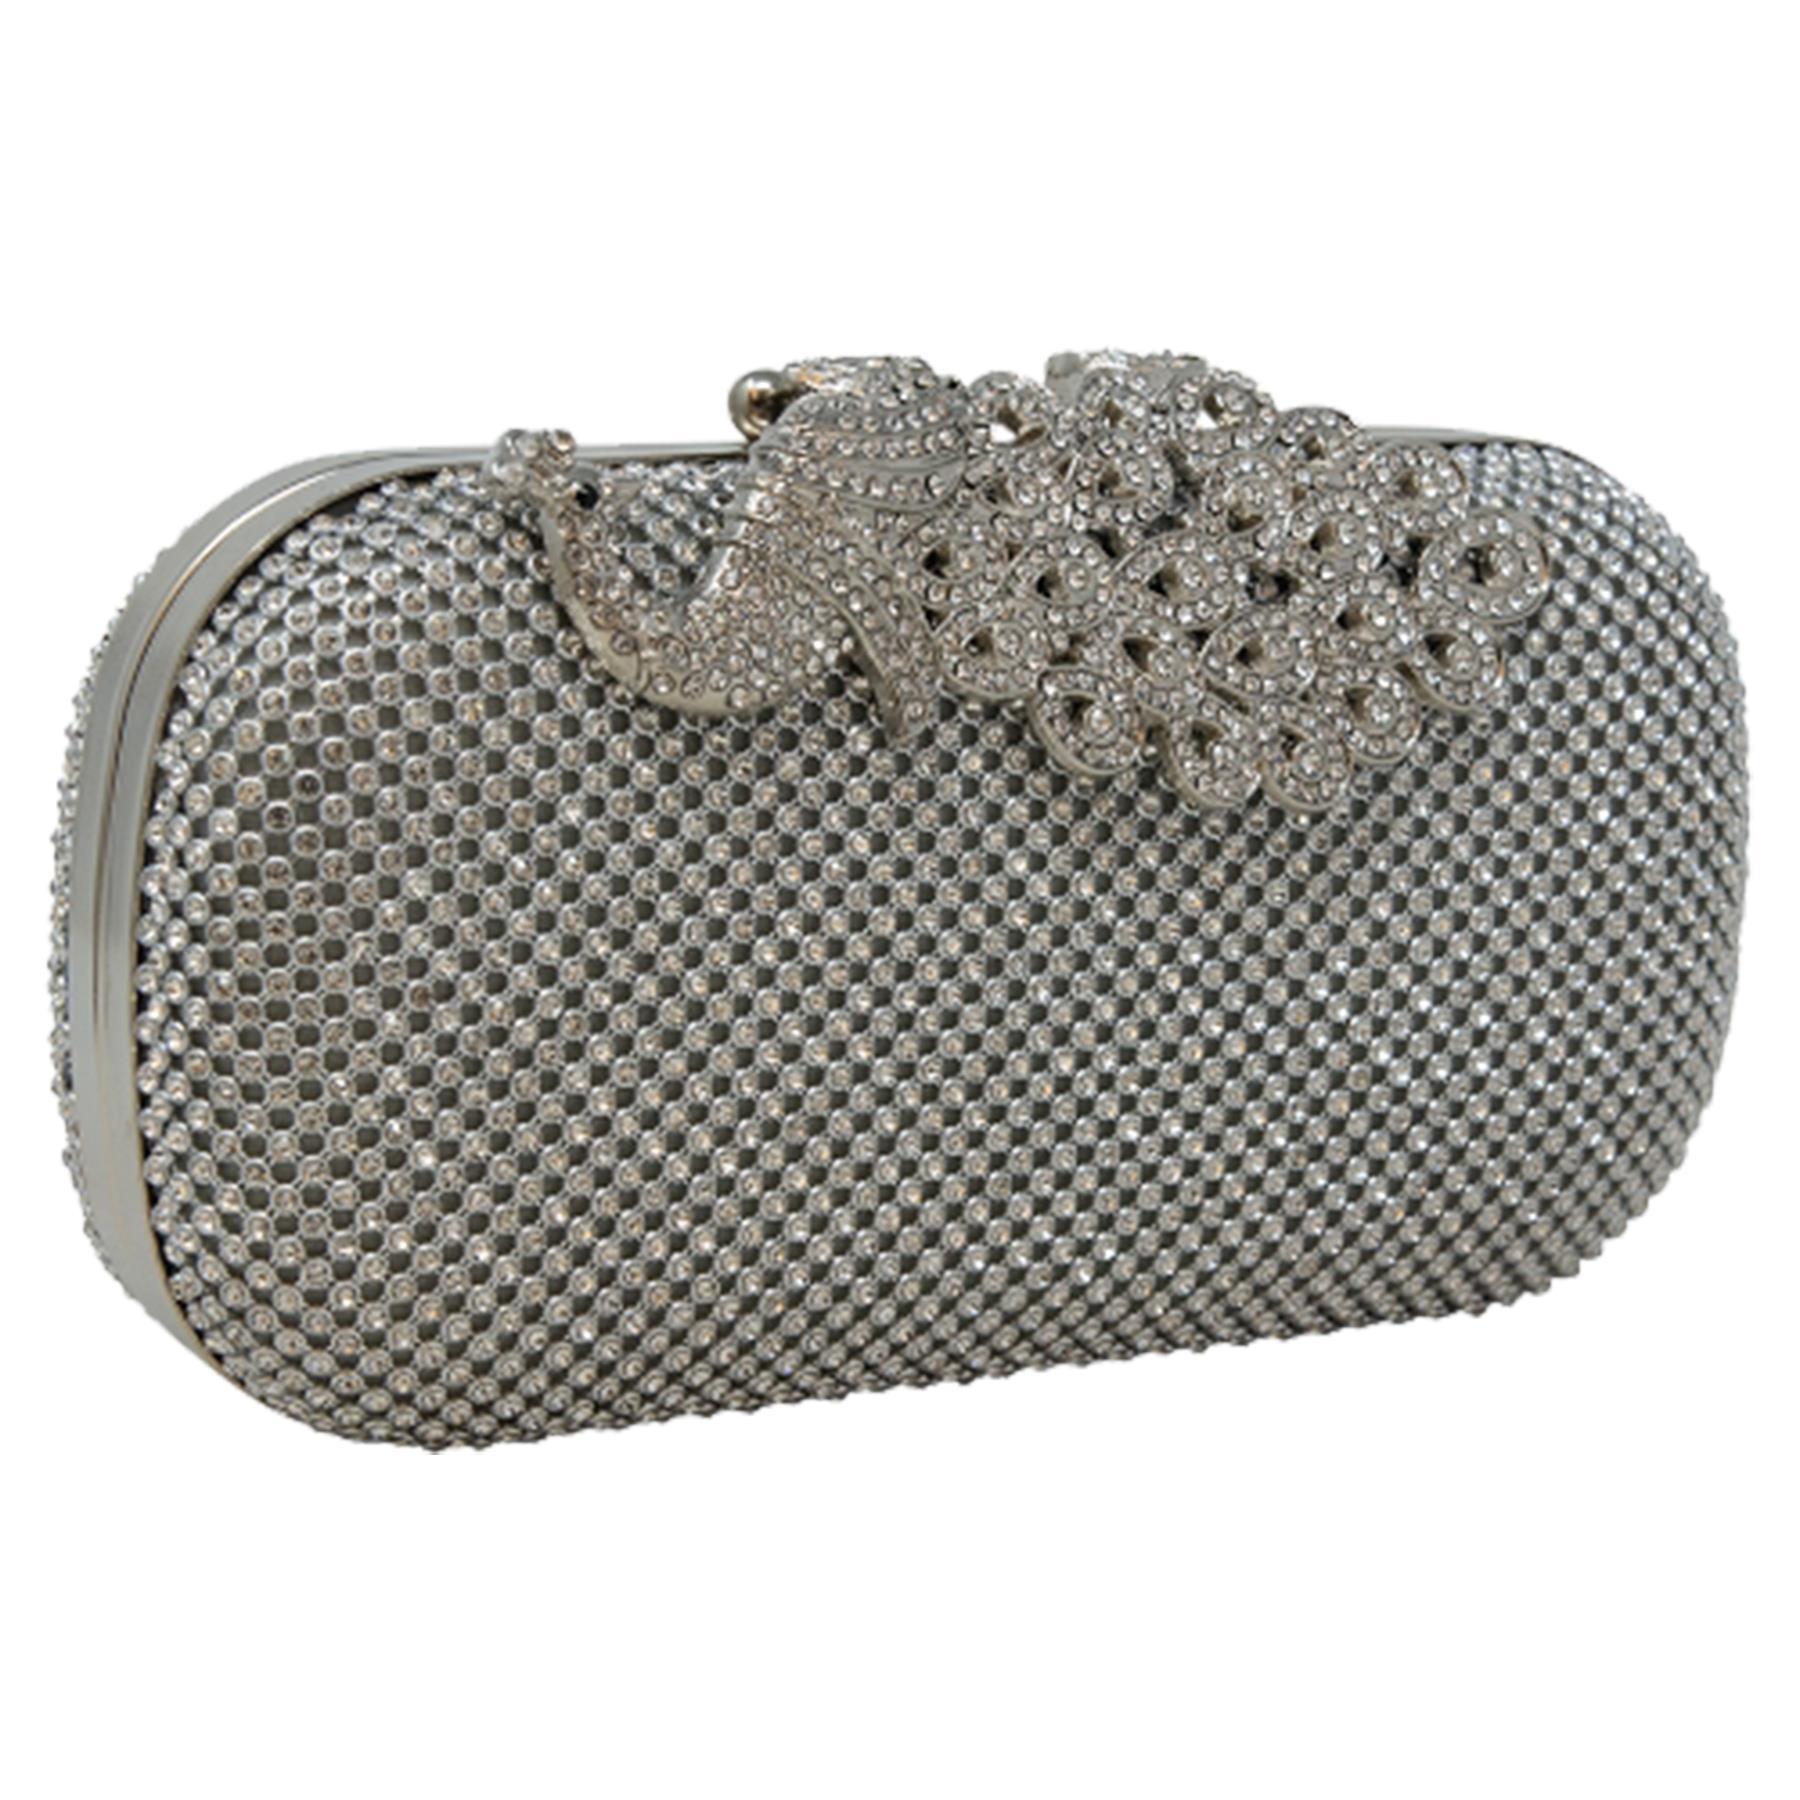 New-Women-s-Jewel-Elephant-Detail-Diamante-Chain-Box-Clutch-Bag-Purse thumbnail 13